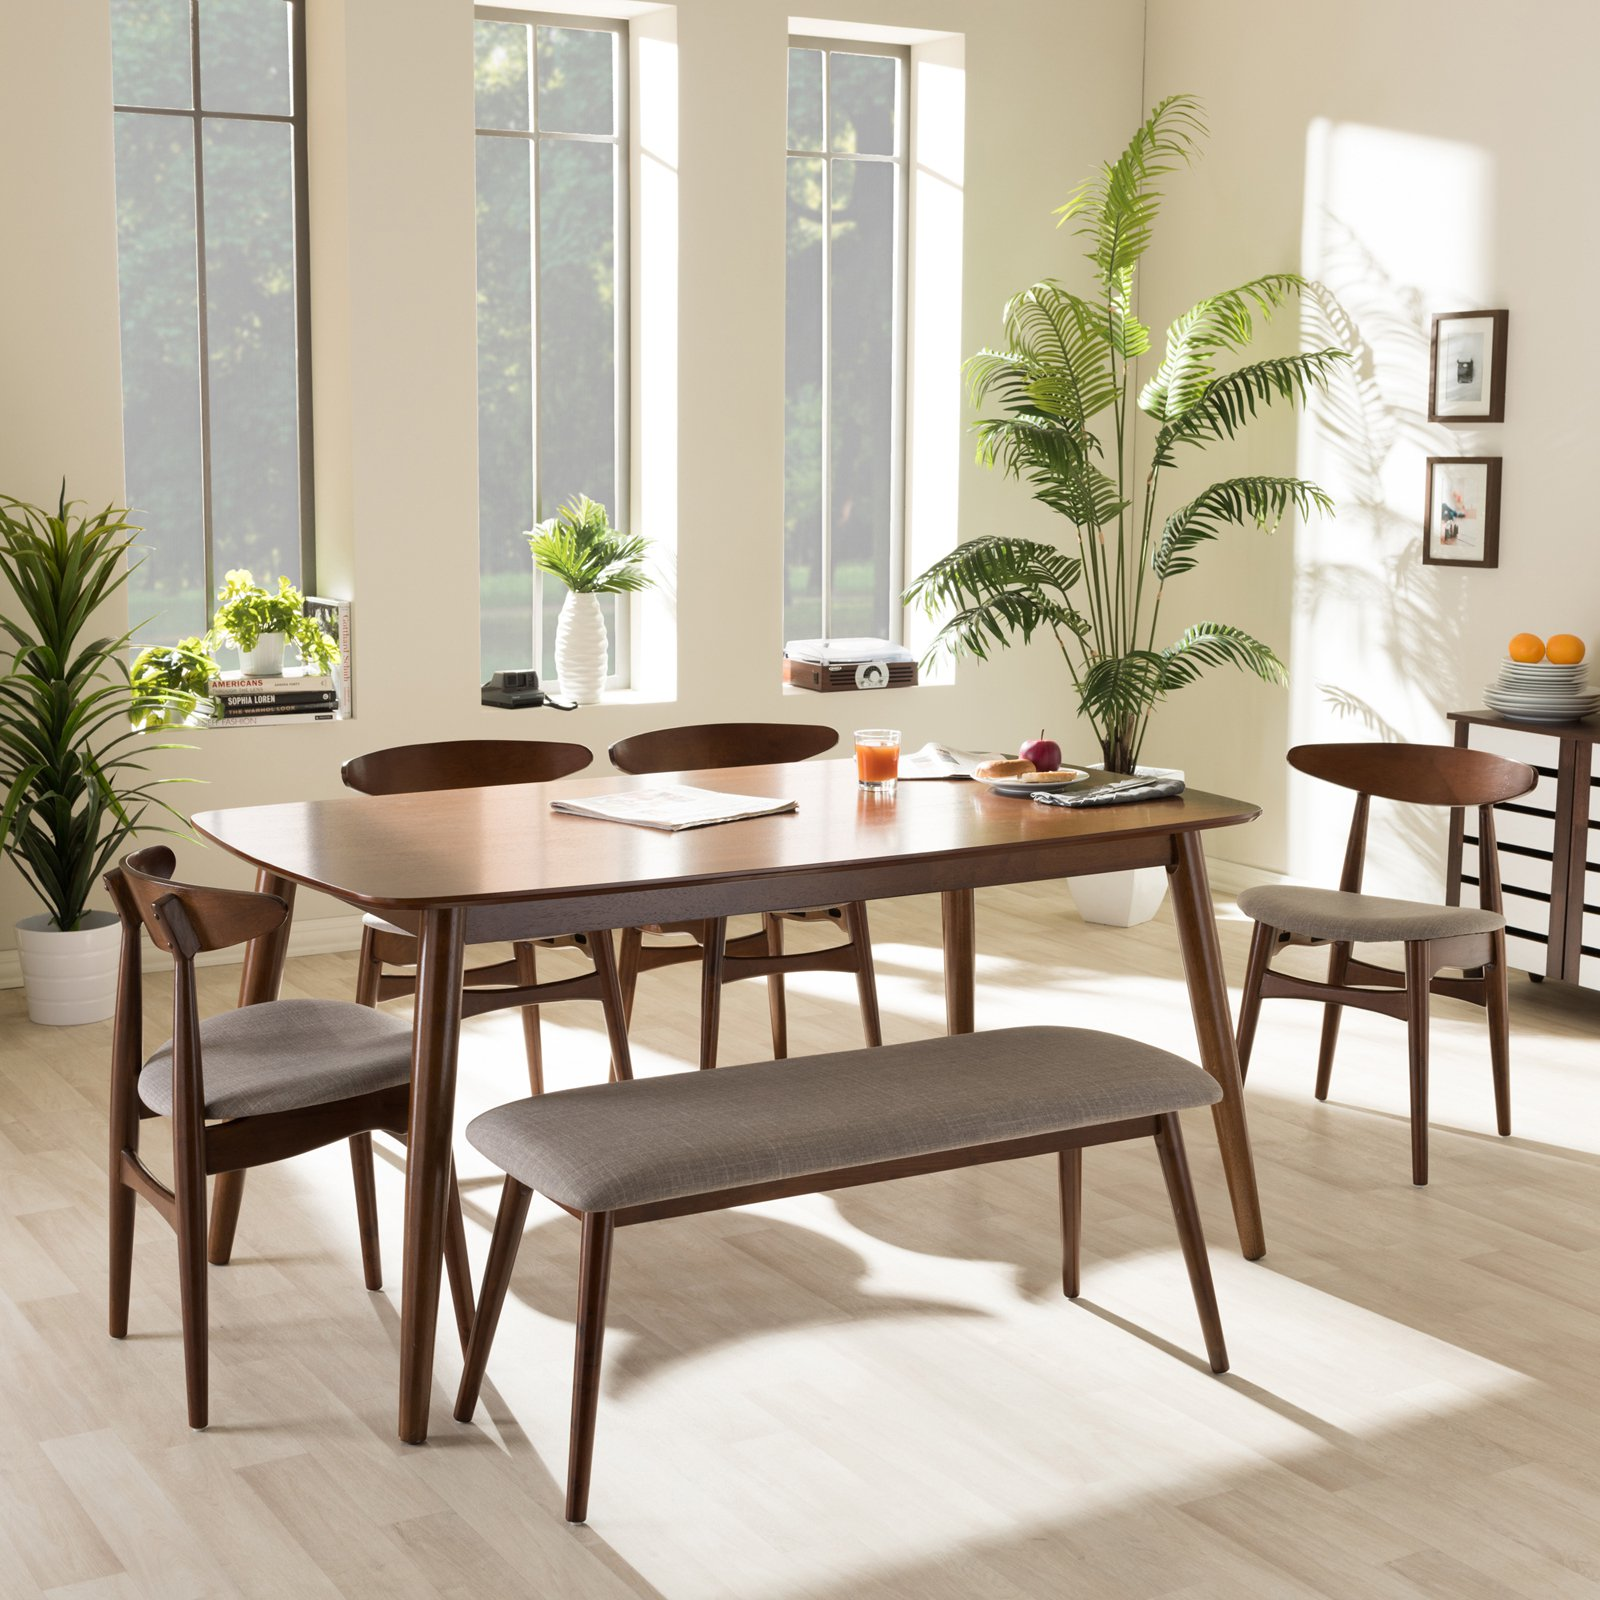 Baxton Studio Flora 6 Piece Dining Table Set